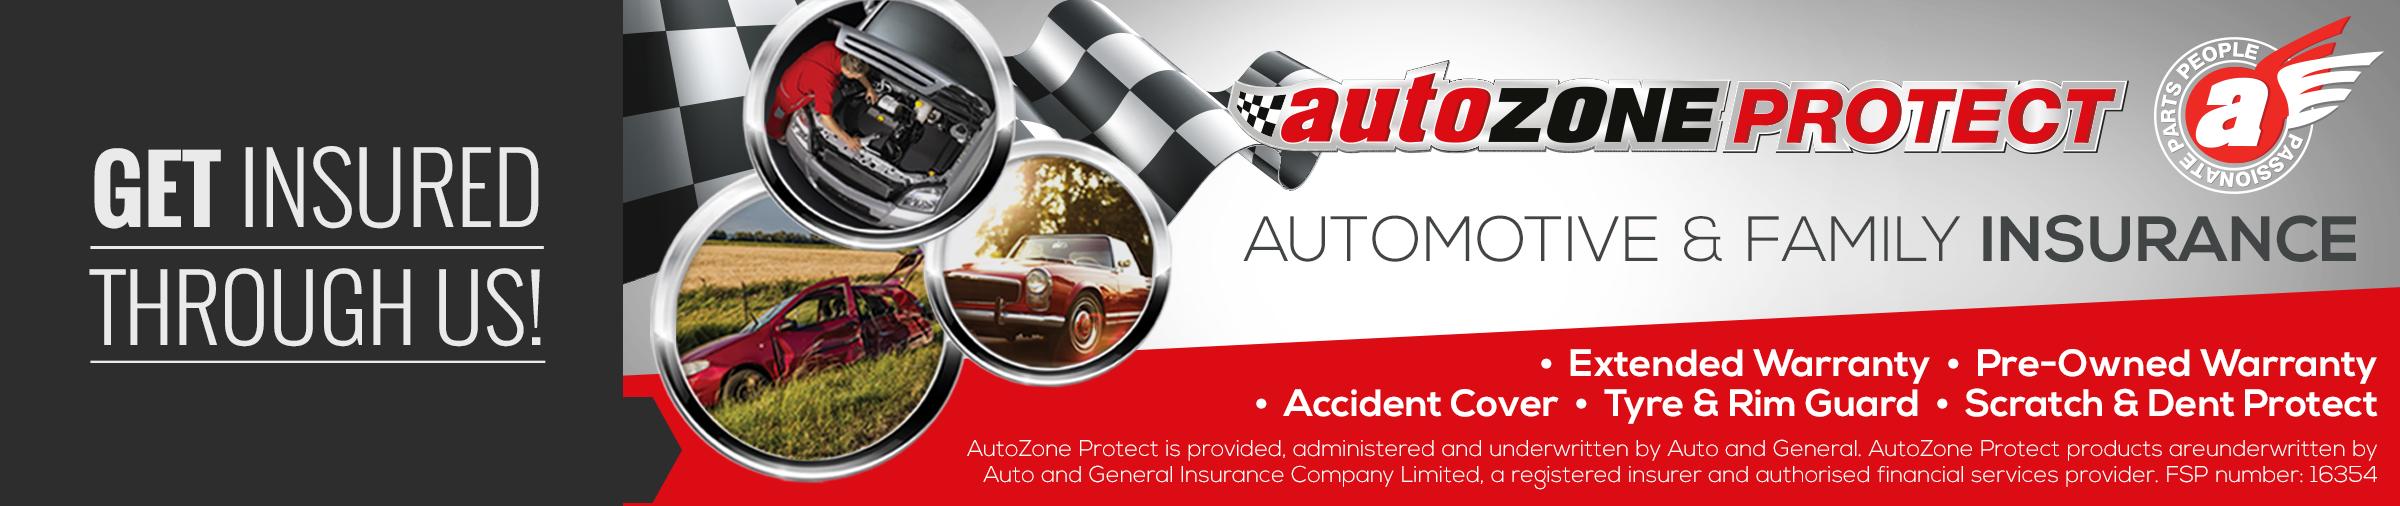 Autozone George | Cars and Bakkies | Phone 044 874 2